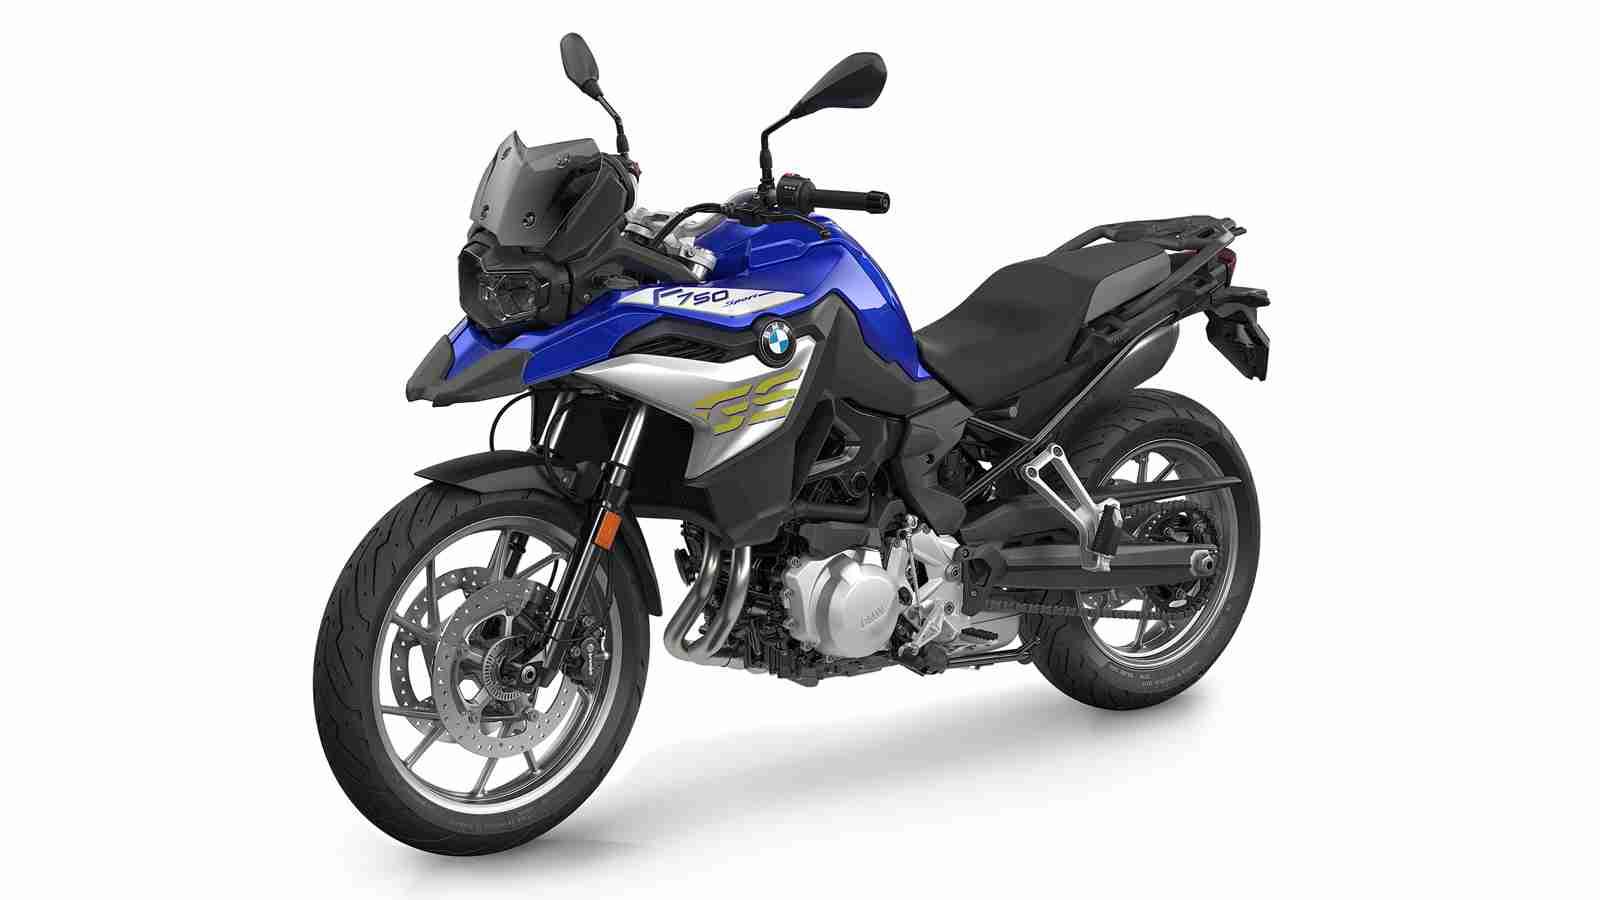 2021 bmw f 750 gs  iamabiker  everything motorcycle